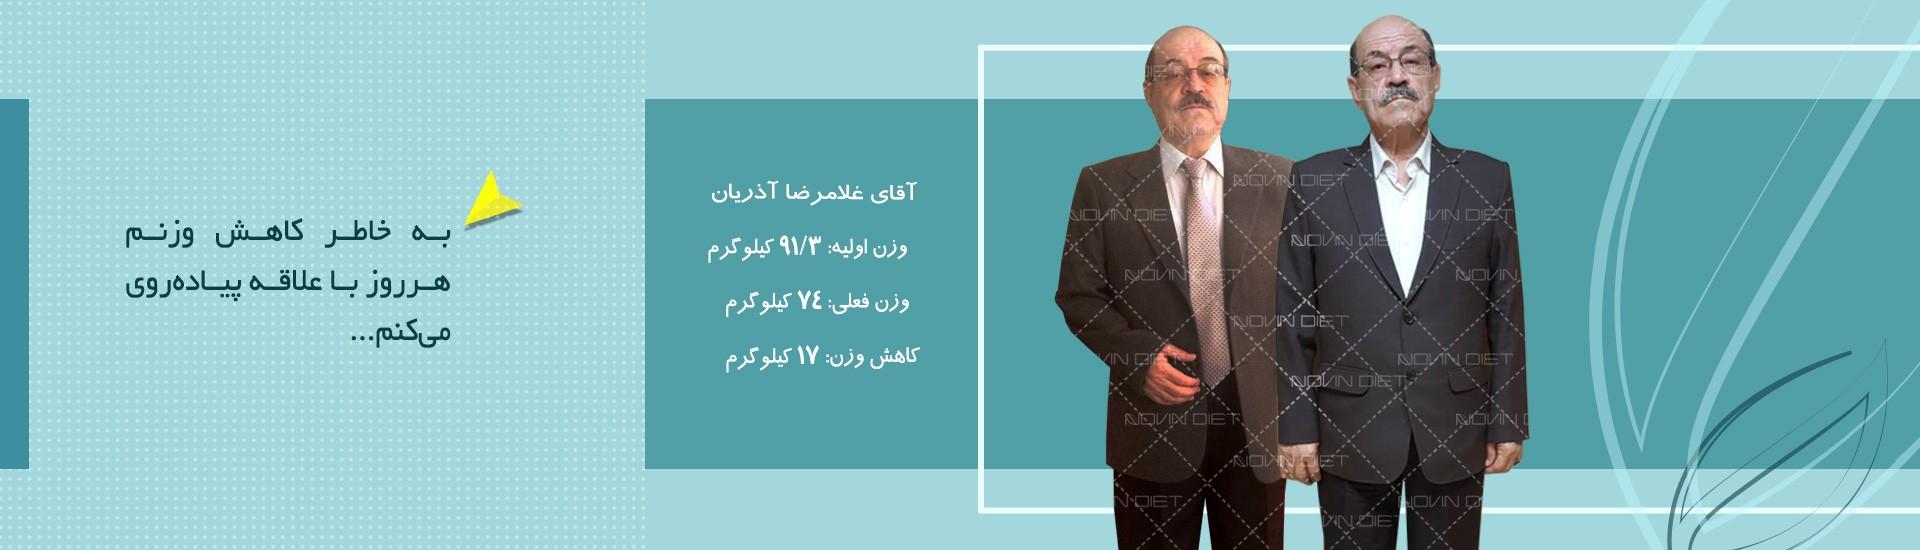 غلامرضا آذریان با 17 کیلوگرم کاهش وزن